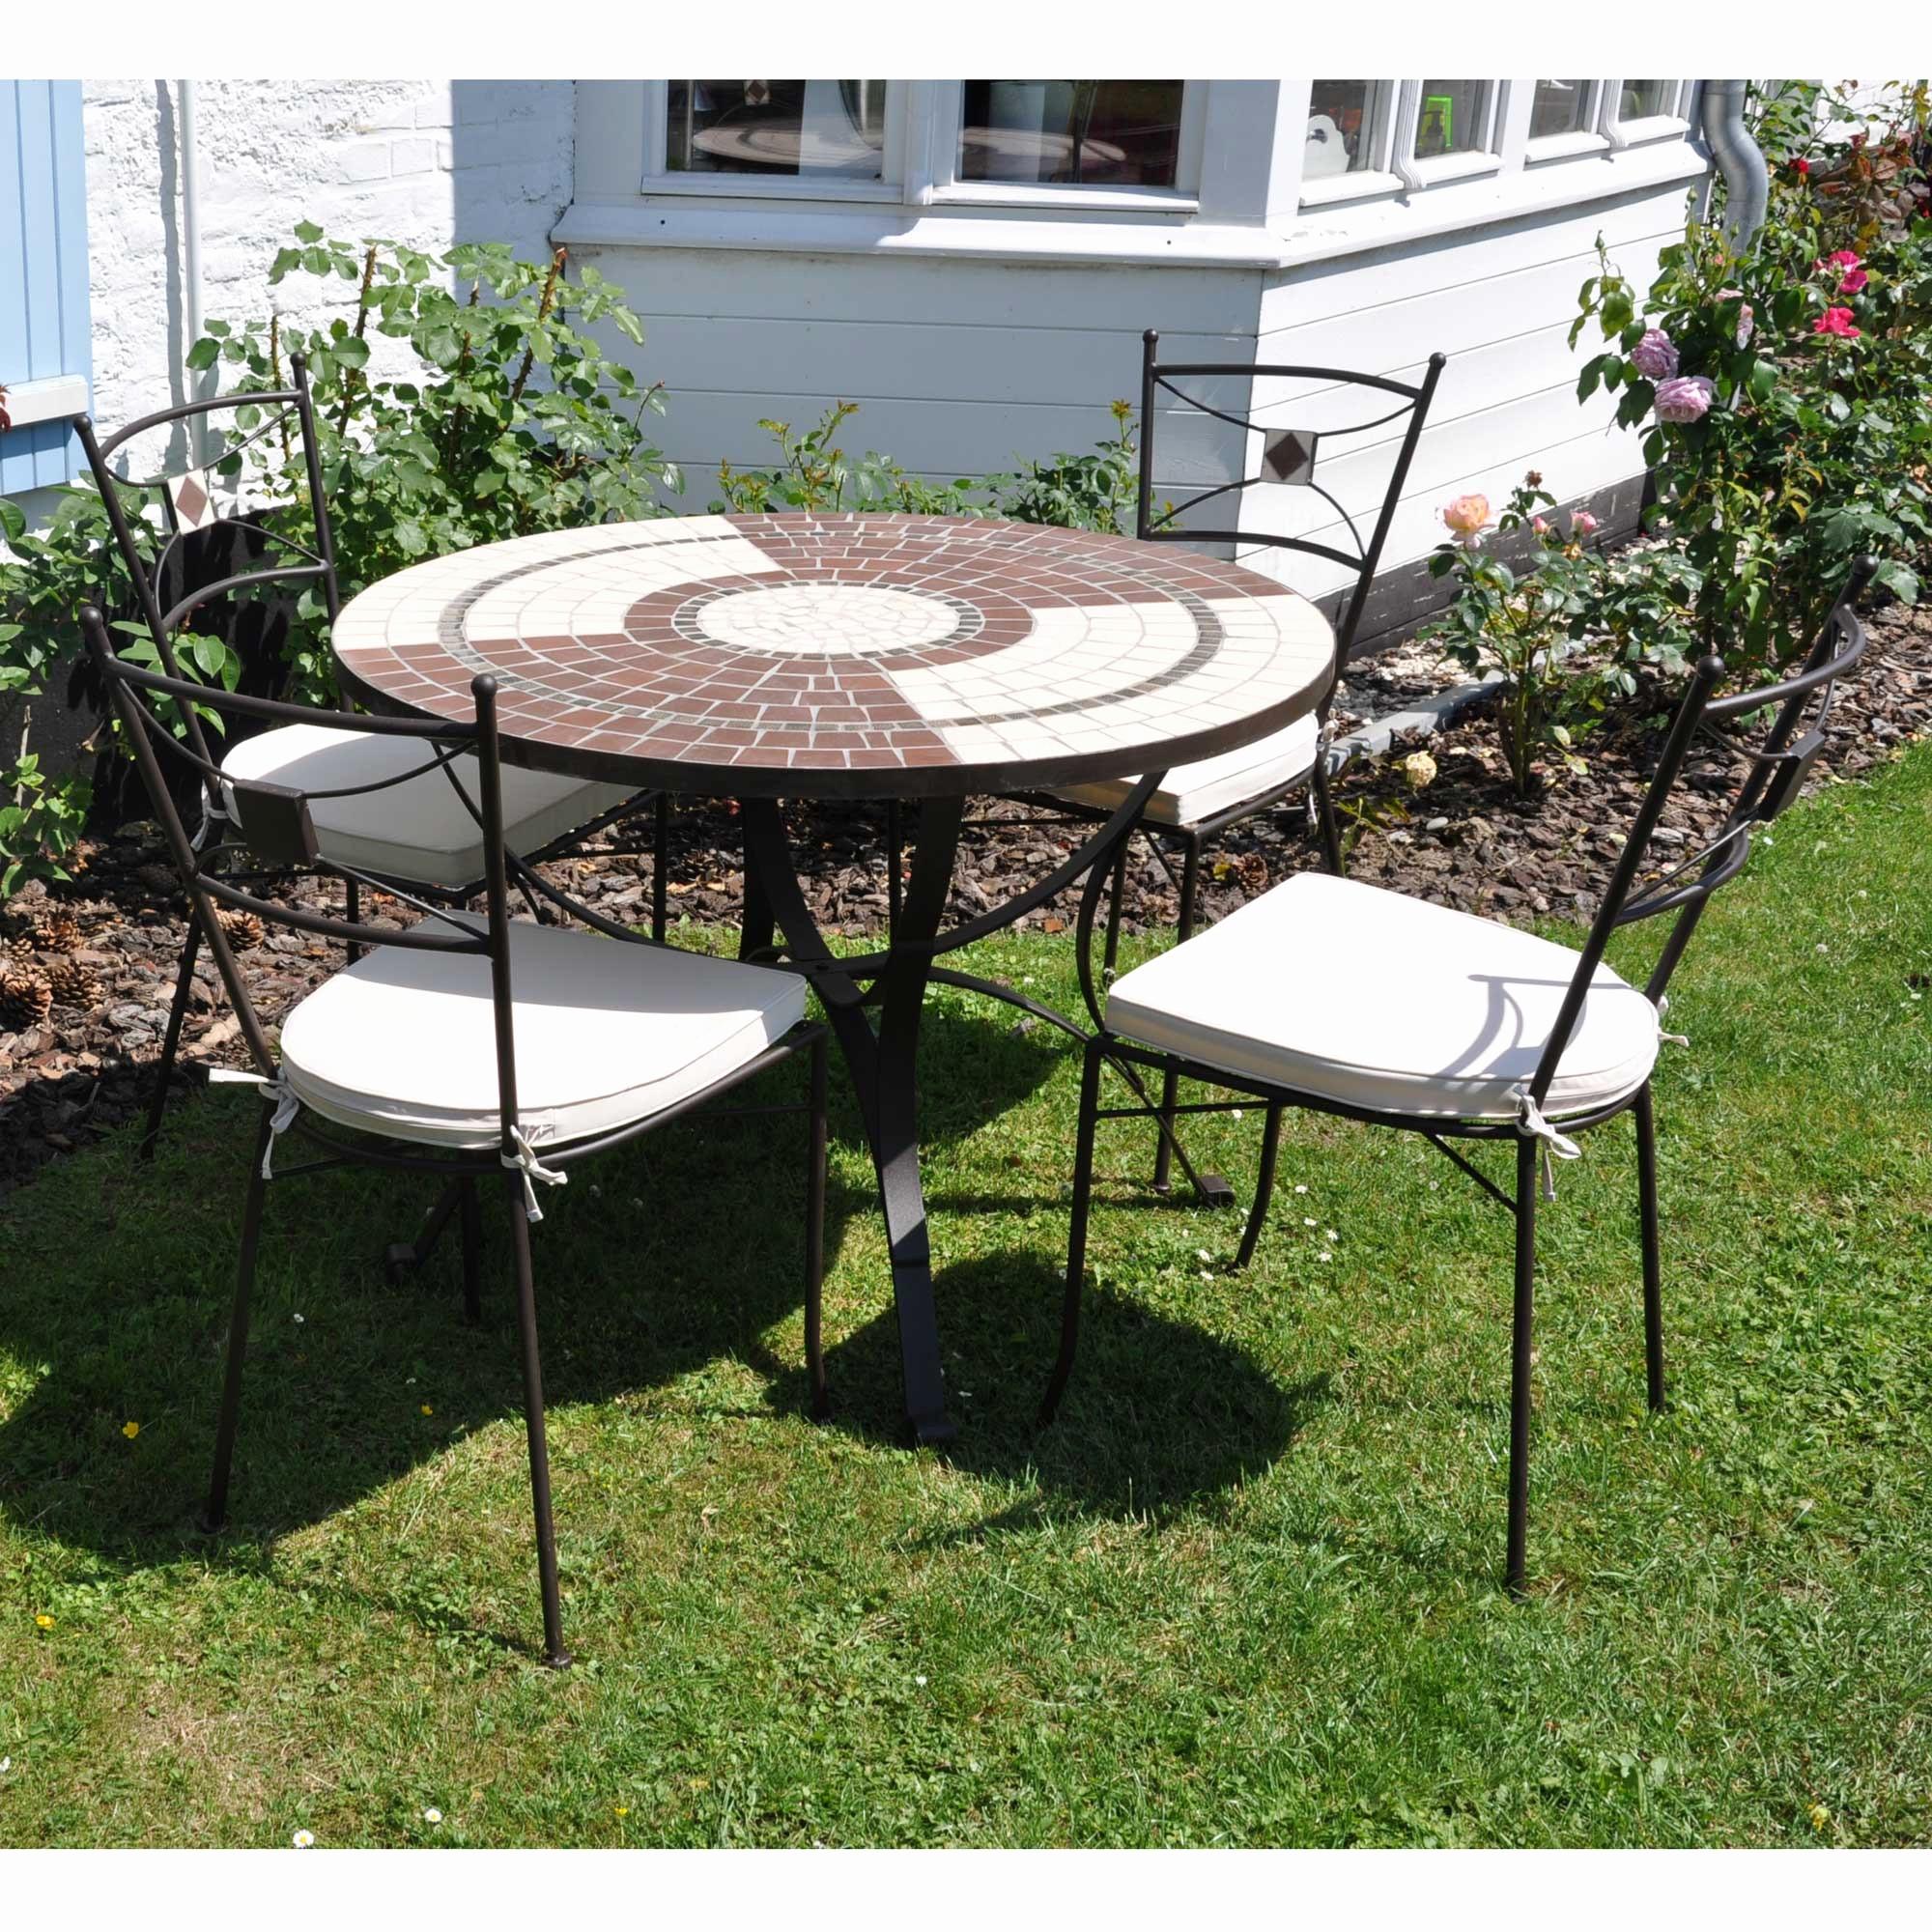 Petite Table Pliante Gifi Élégant Photos Salon De Jardin Gifi Catalogue Ainsi Que Luxueux 50 Inspirant Gifi